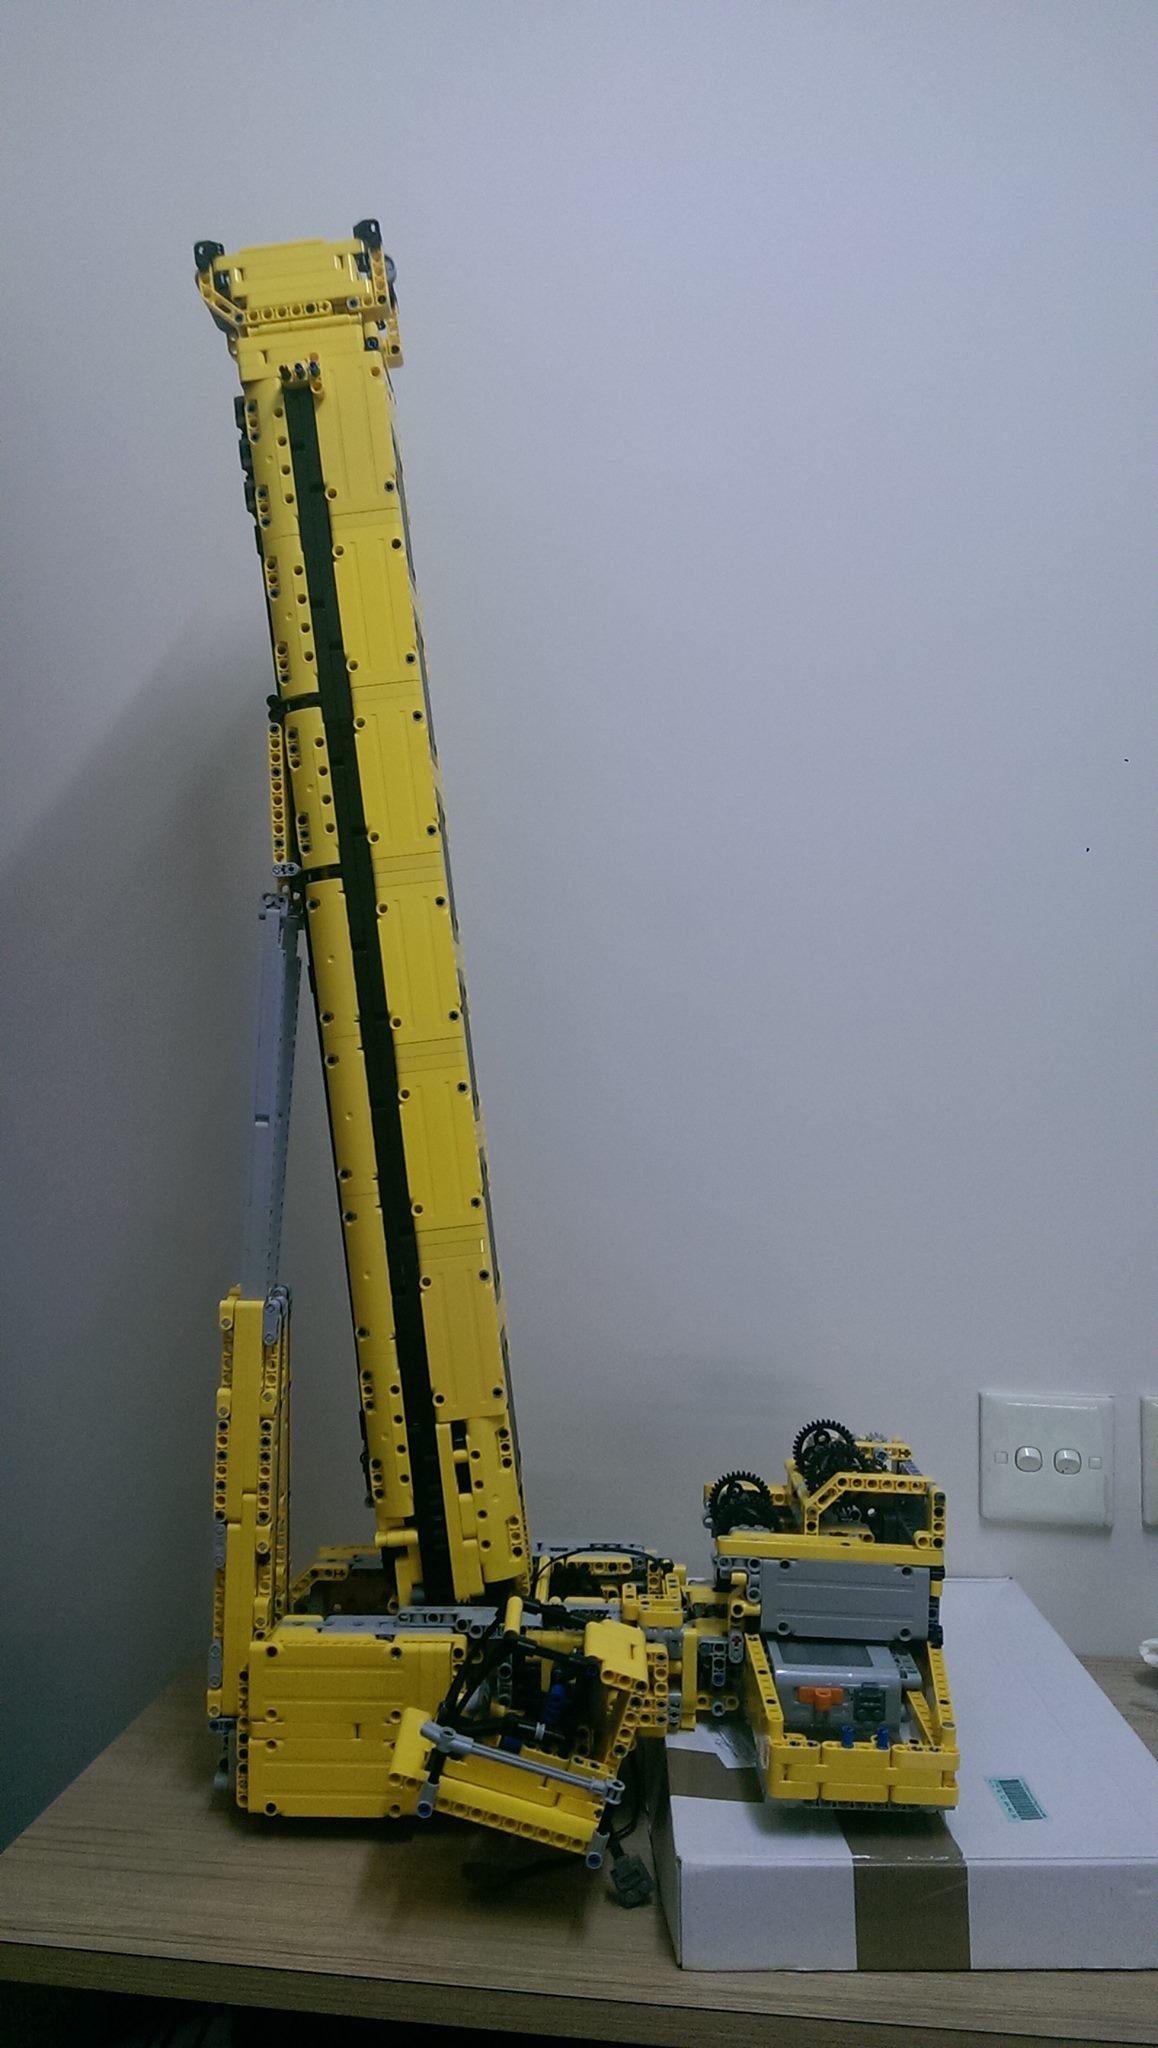 Lego Moc Ltm 1750 9 1 By Msera0099 Rebrickable Build With Lego